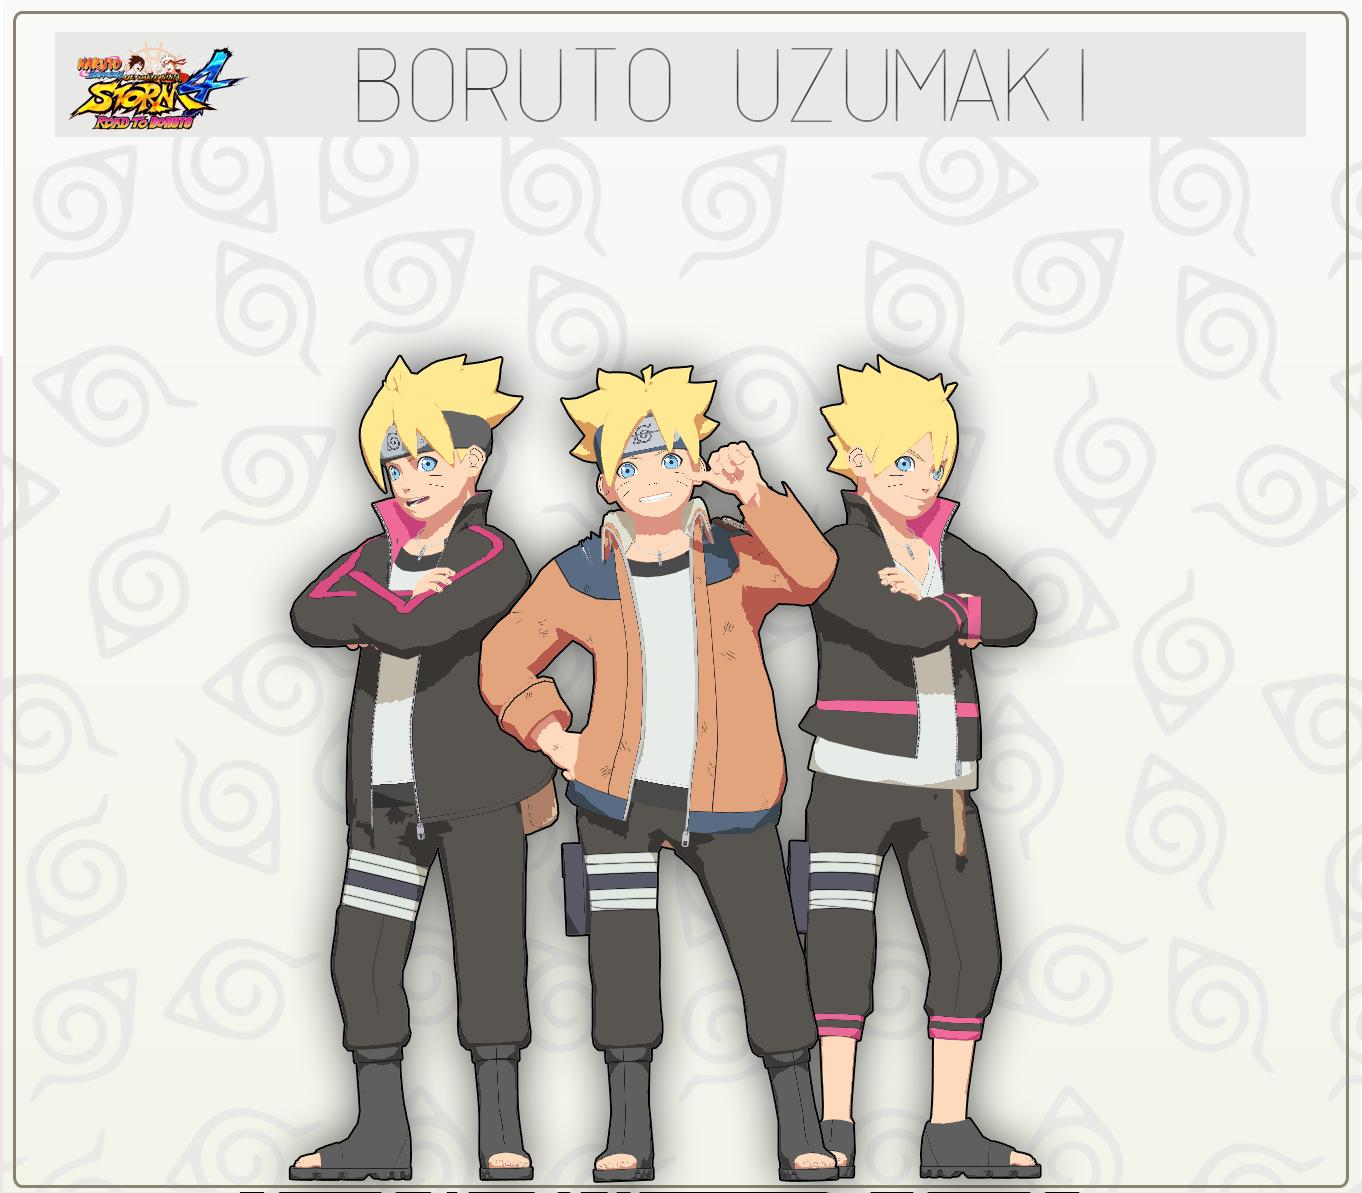 Download Wallpaper Naruto Hypebeast - mmd_boruto_uzumaki_pack___dl_by_narashadows-dbnbmkd  Image_521333.png